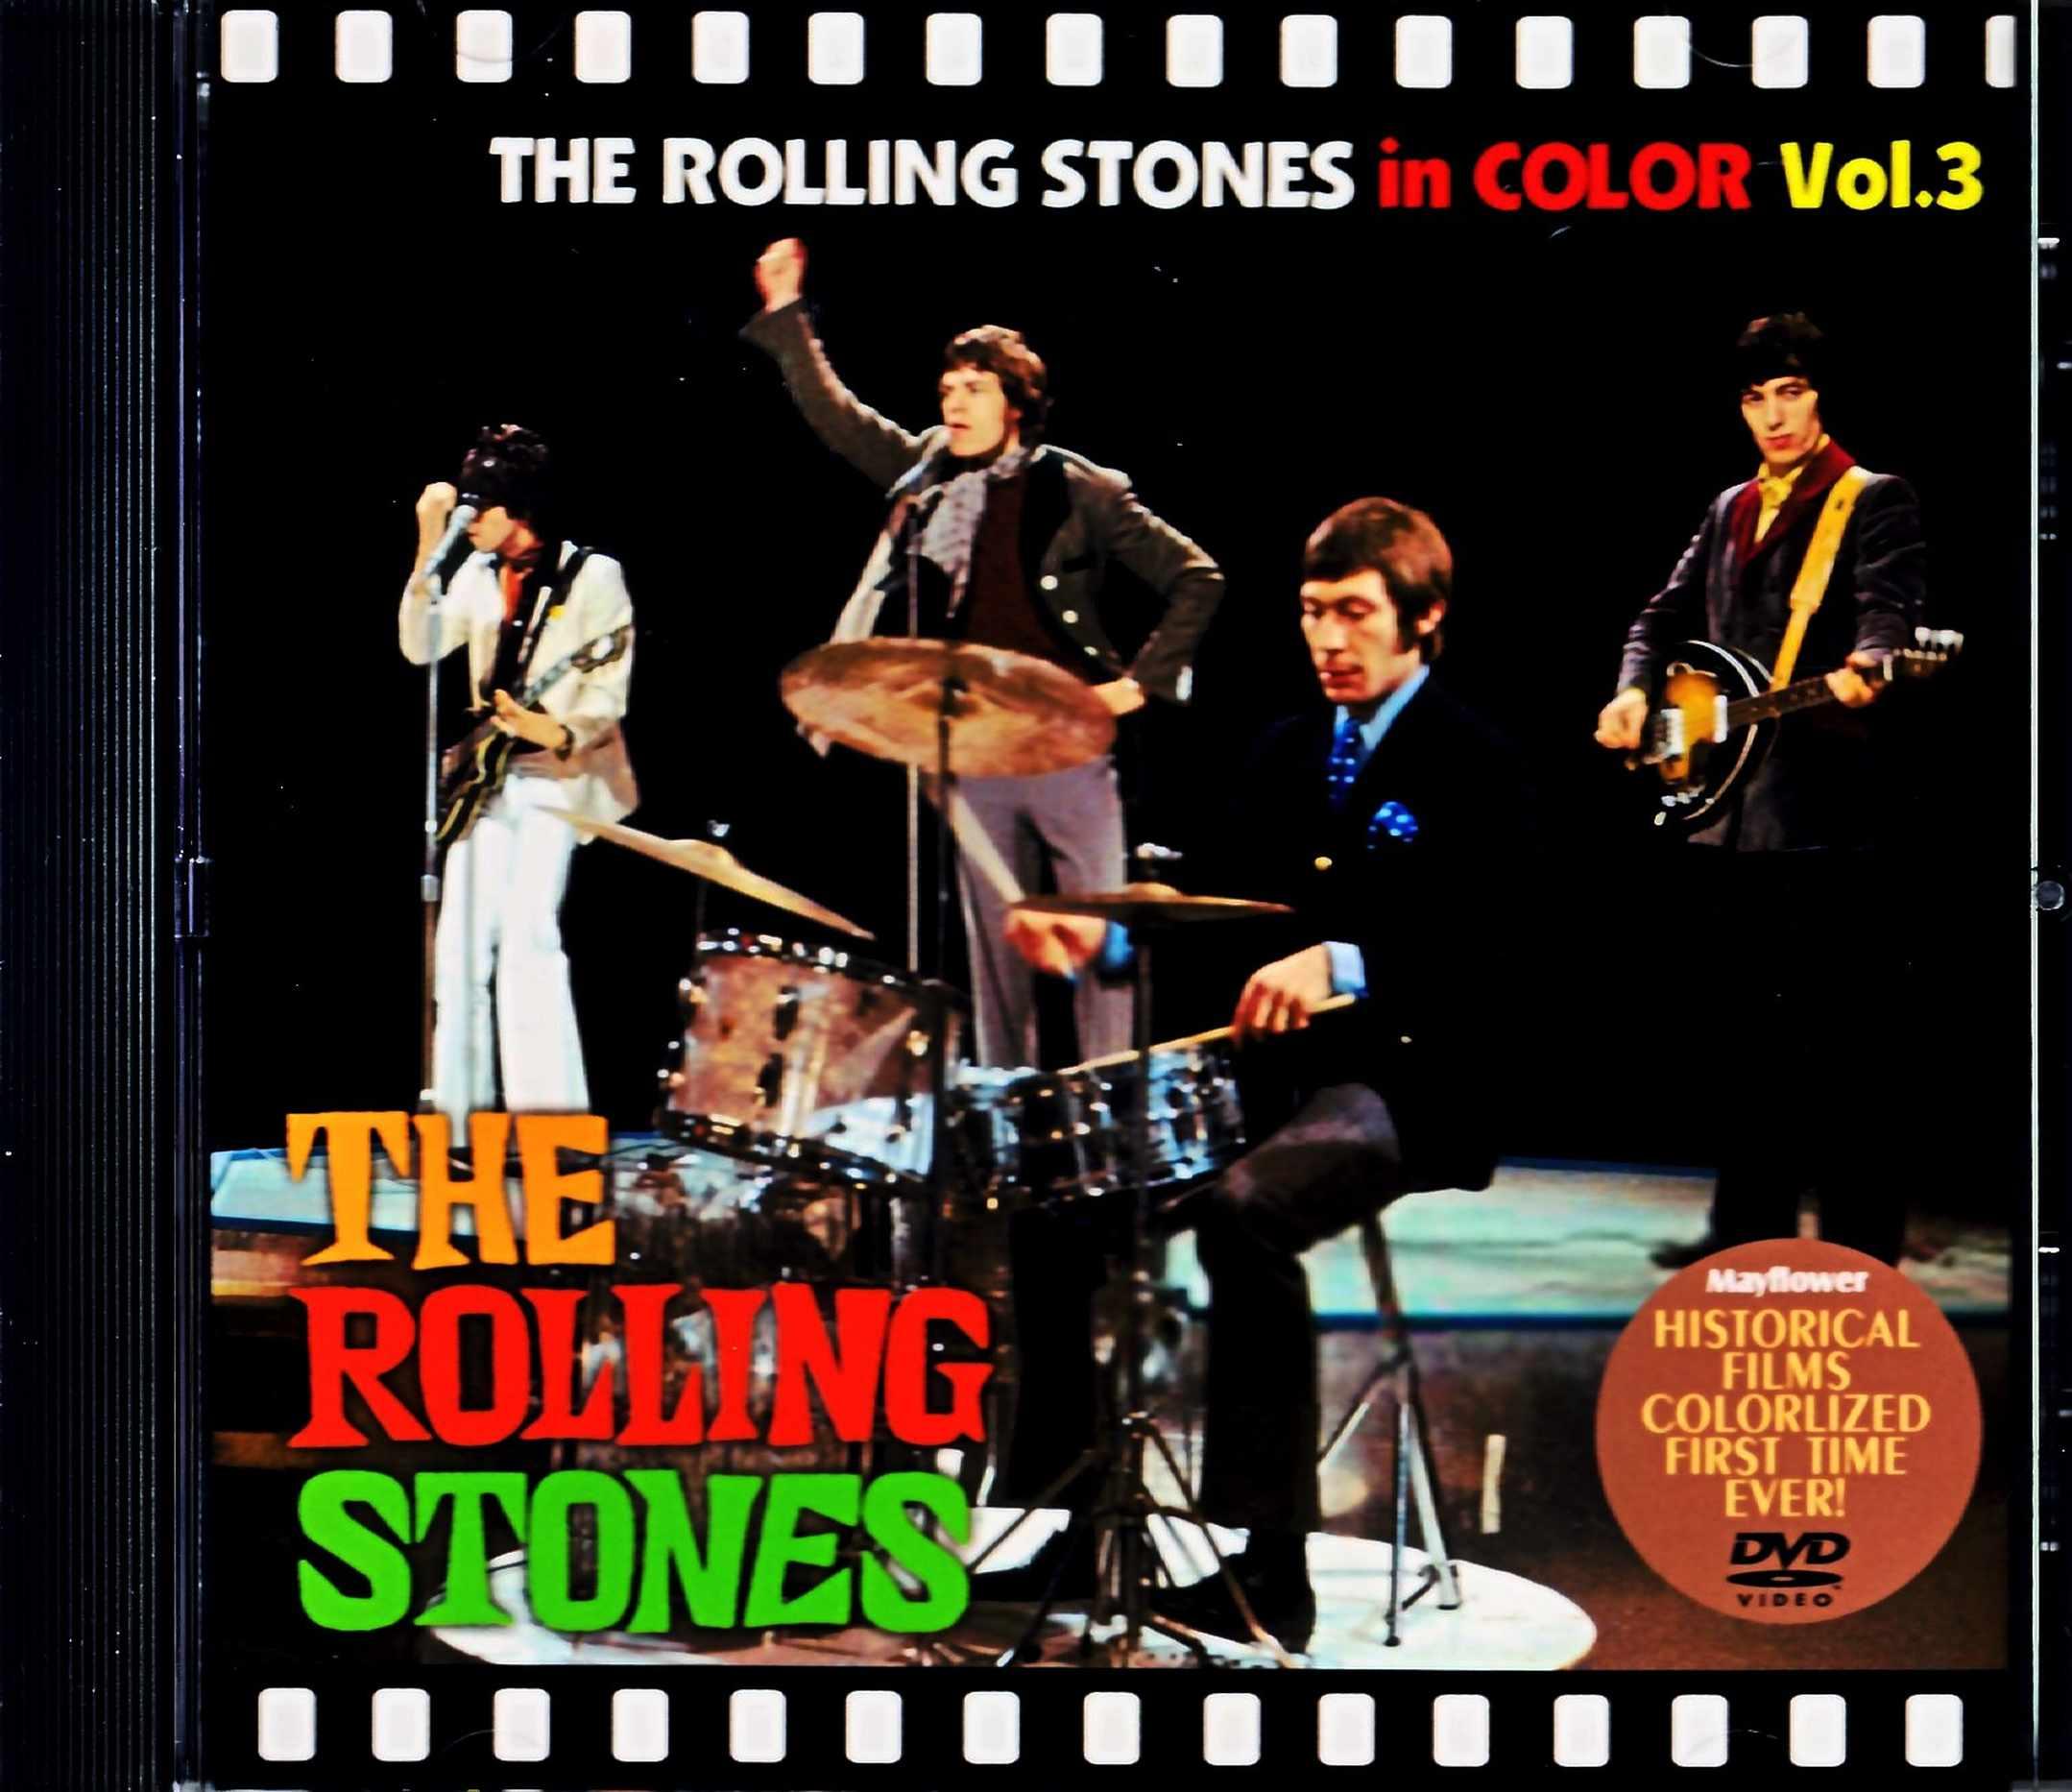 Rolling Stones ローリング・ストーンズ/Historical Films 1964-1965 Vol.3 カラー版・第三弾